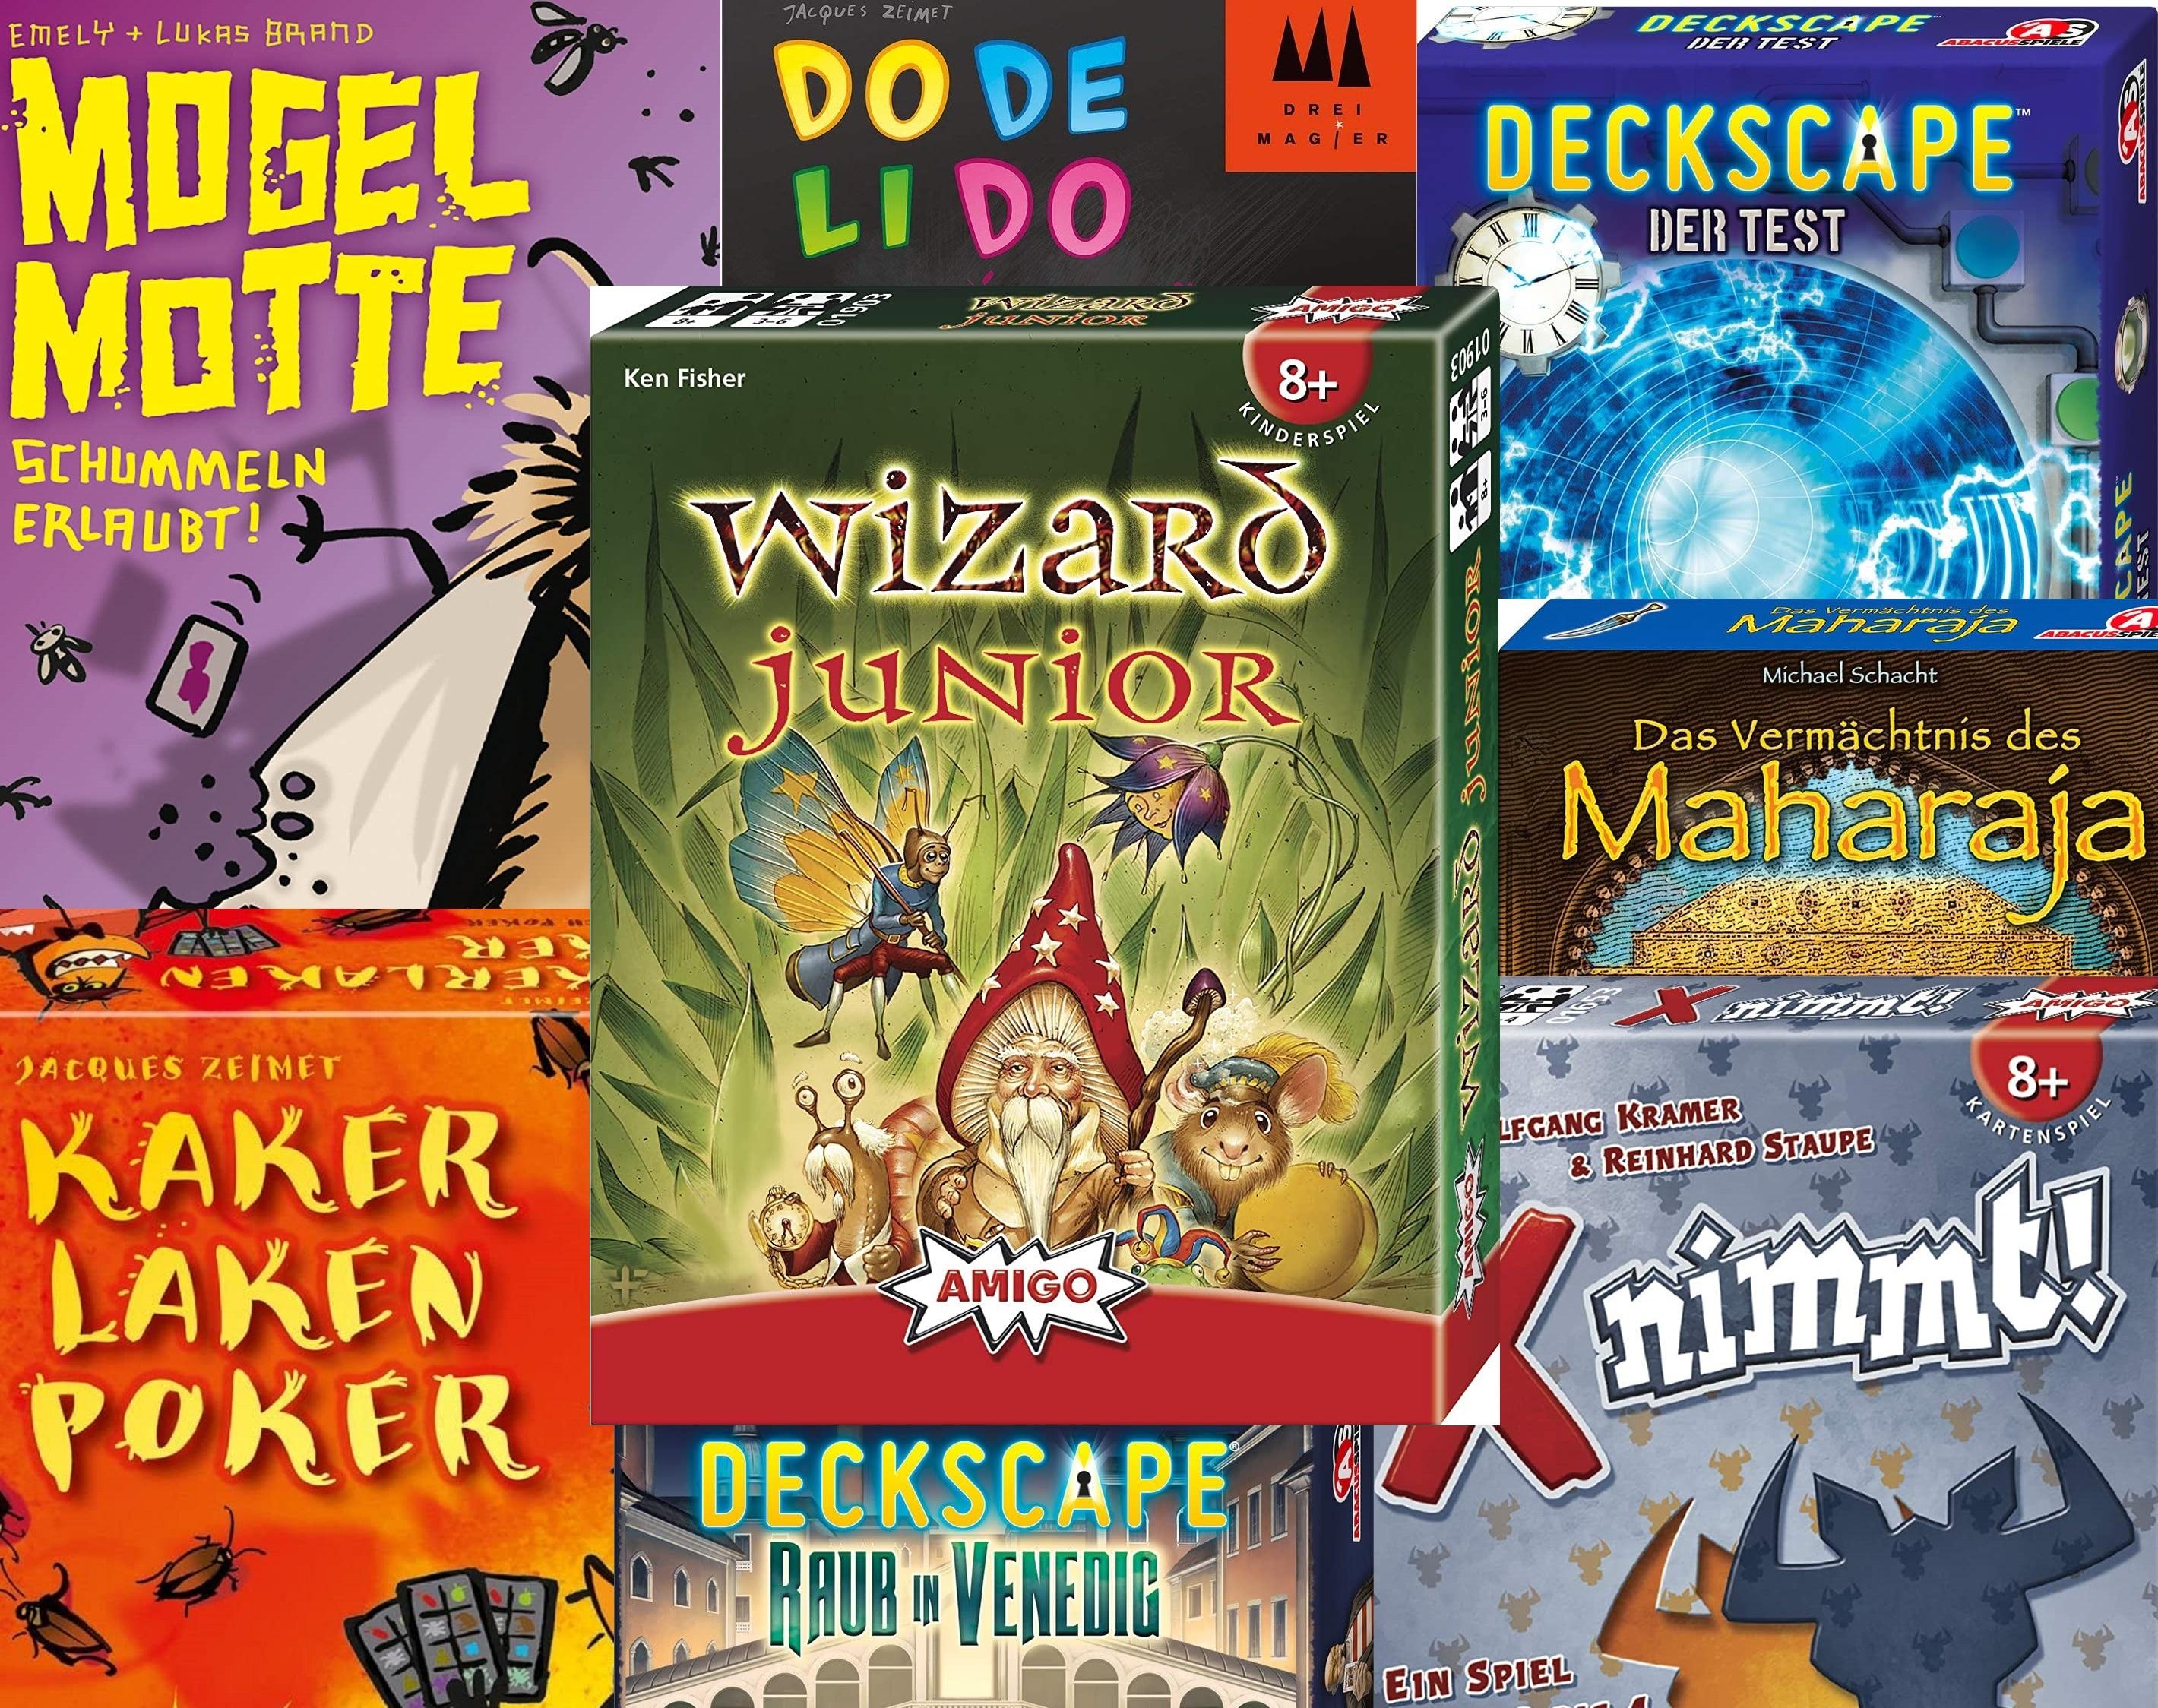 [Prime] Kartenspiele Sammeldeal (8), Dodelido, Mogel Motte, Kakerlakenpoker, X Nimmt, Wizard Junior z.B. AS Deckscape - Der Test (BGG 6,7)